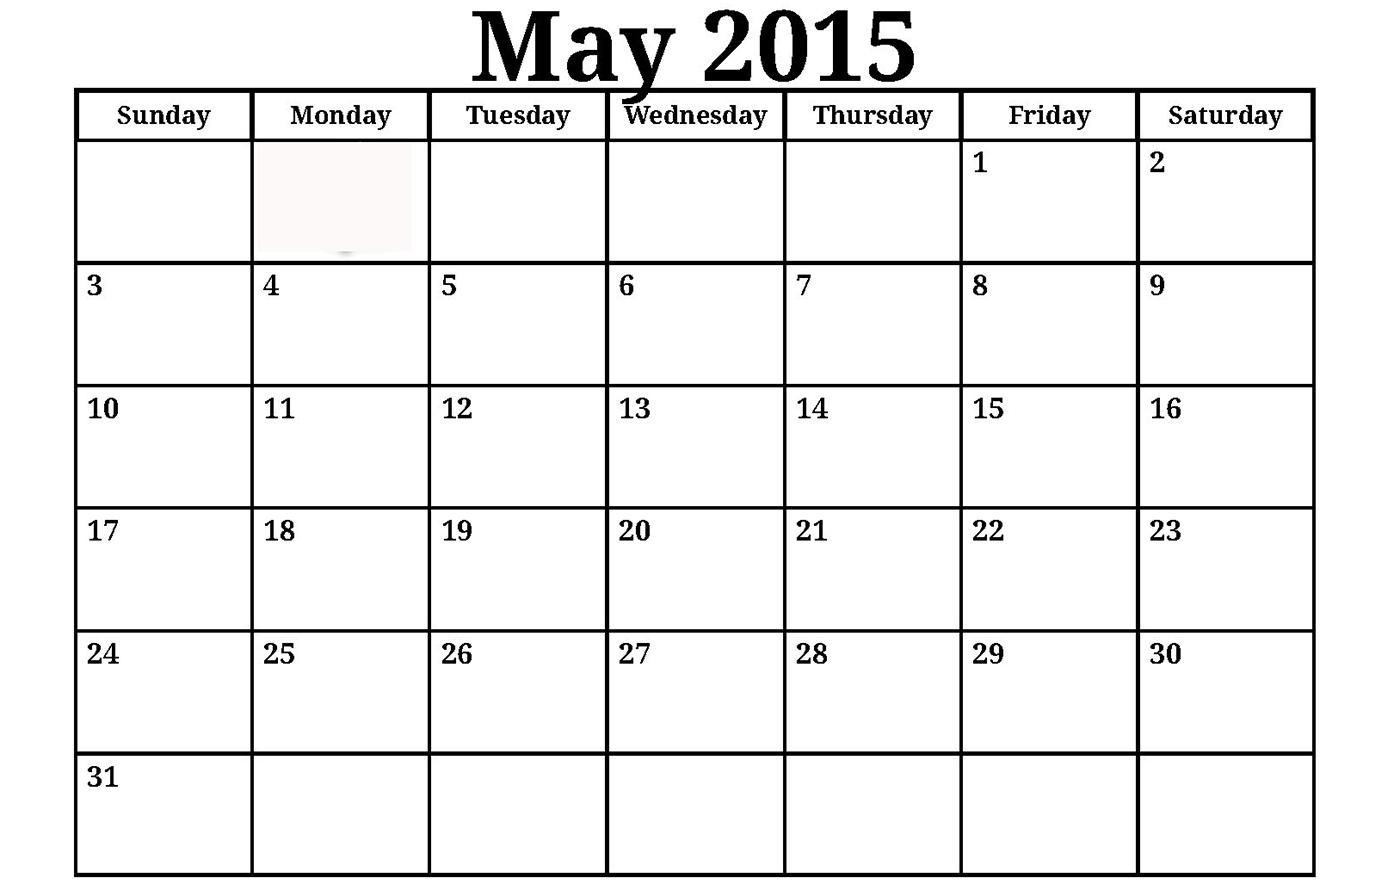 2015 May Calendar Template 3 Calendar Pinterest 89uj